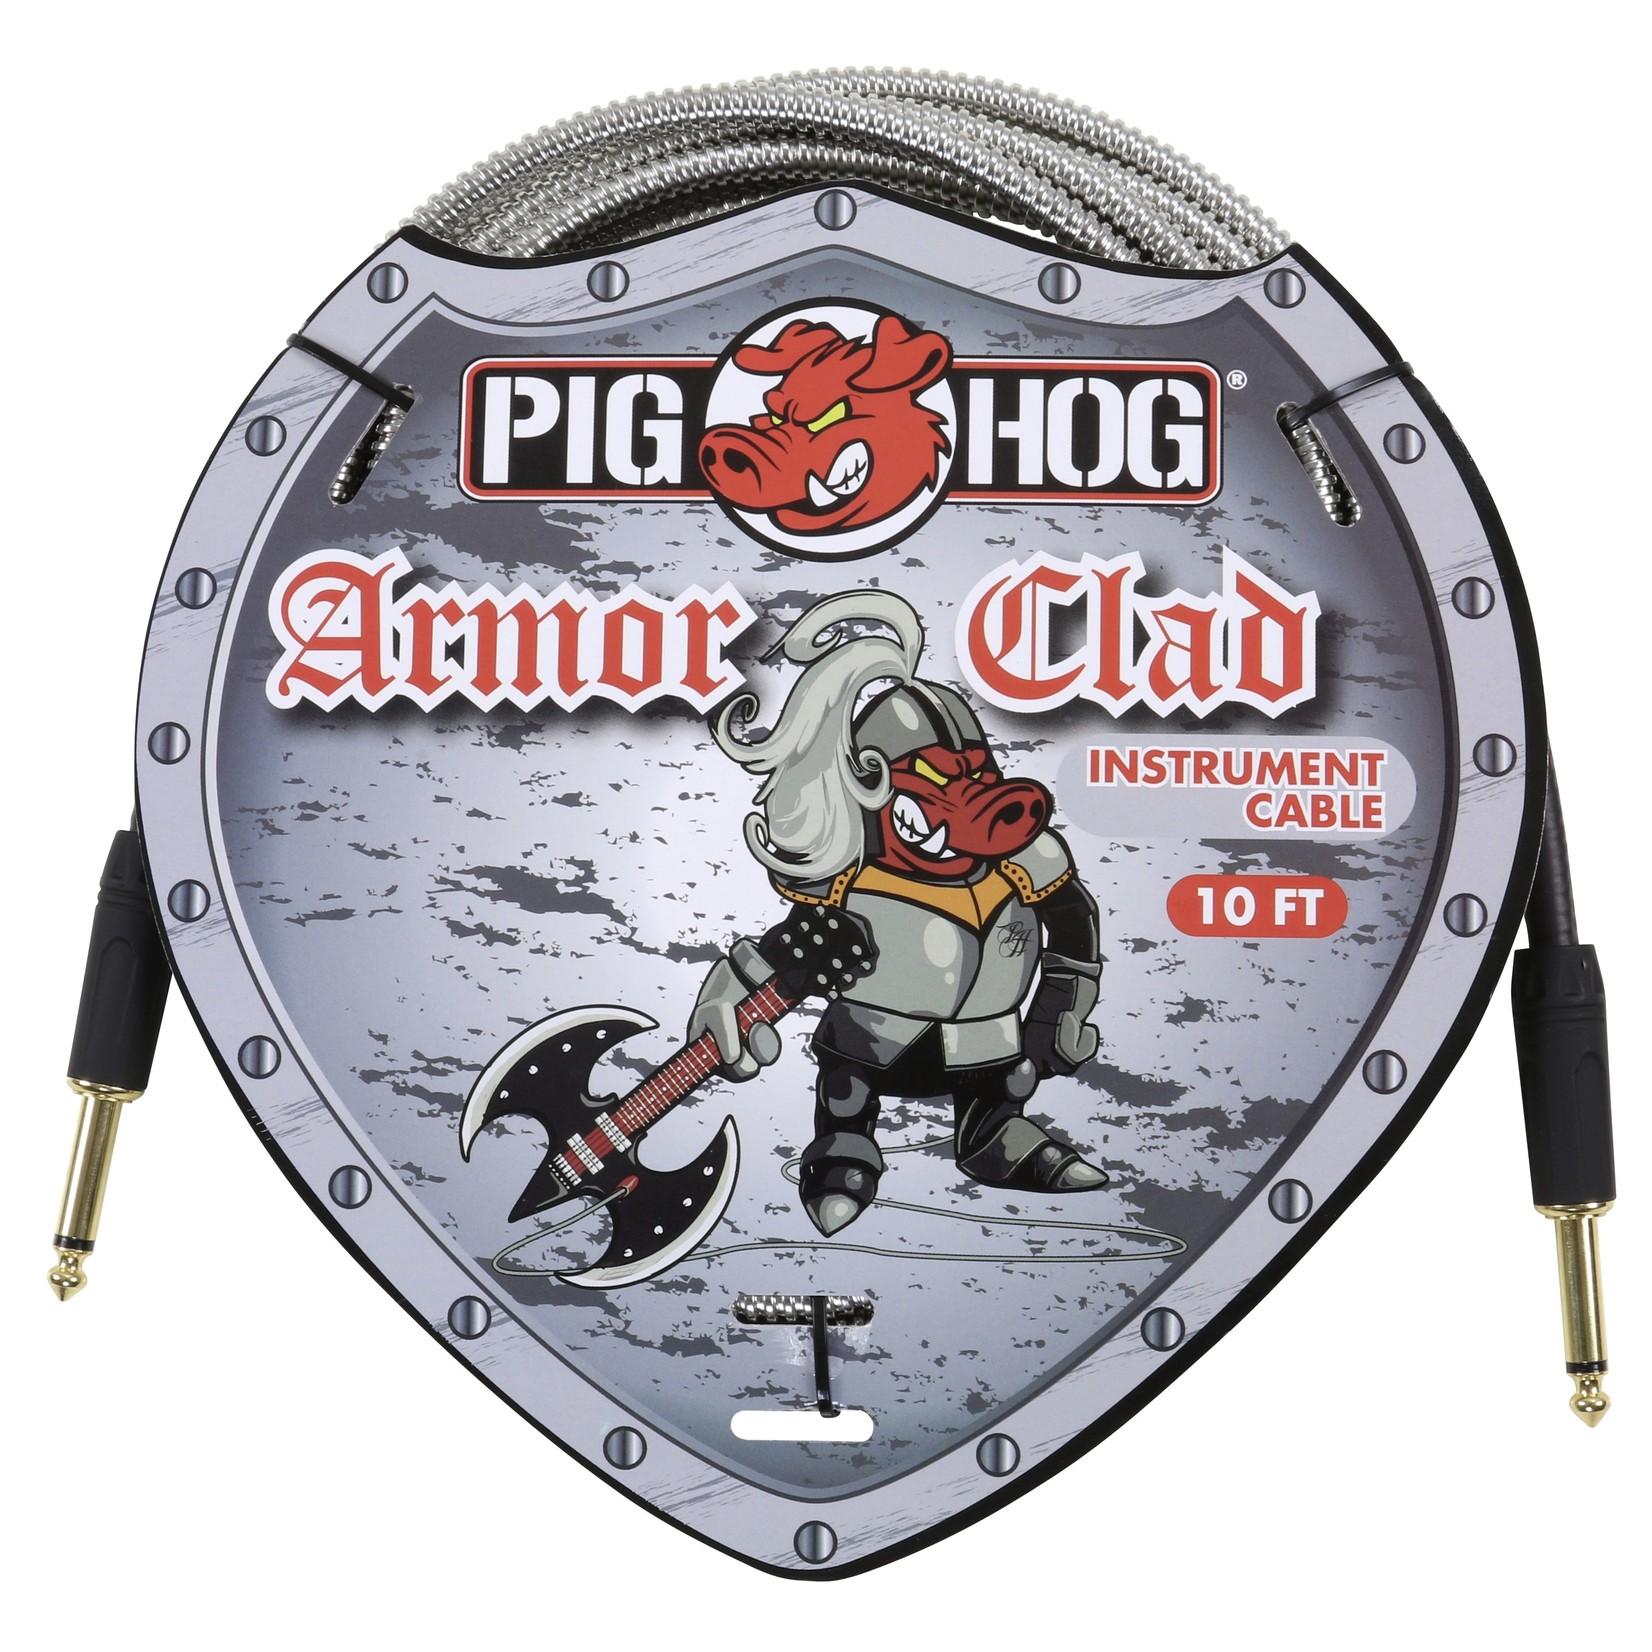 "Pig Hog Pig Hog ""Armor Clad"" Instrument Cable, 10 ft  -Vintage Series  Industrial Conduit-Style Metal Jacket"